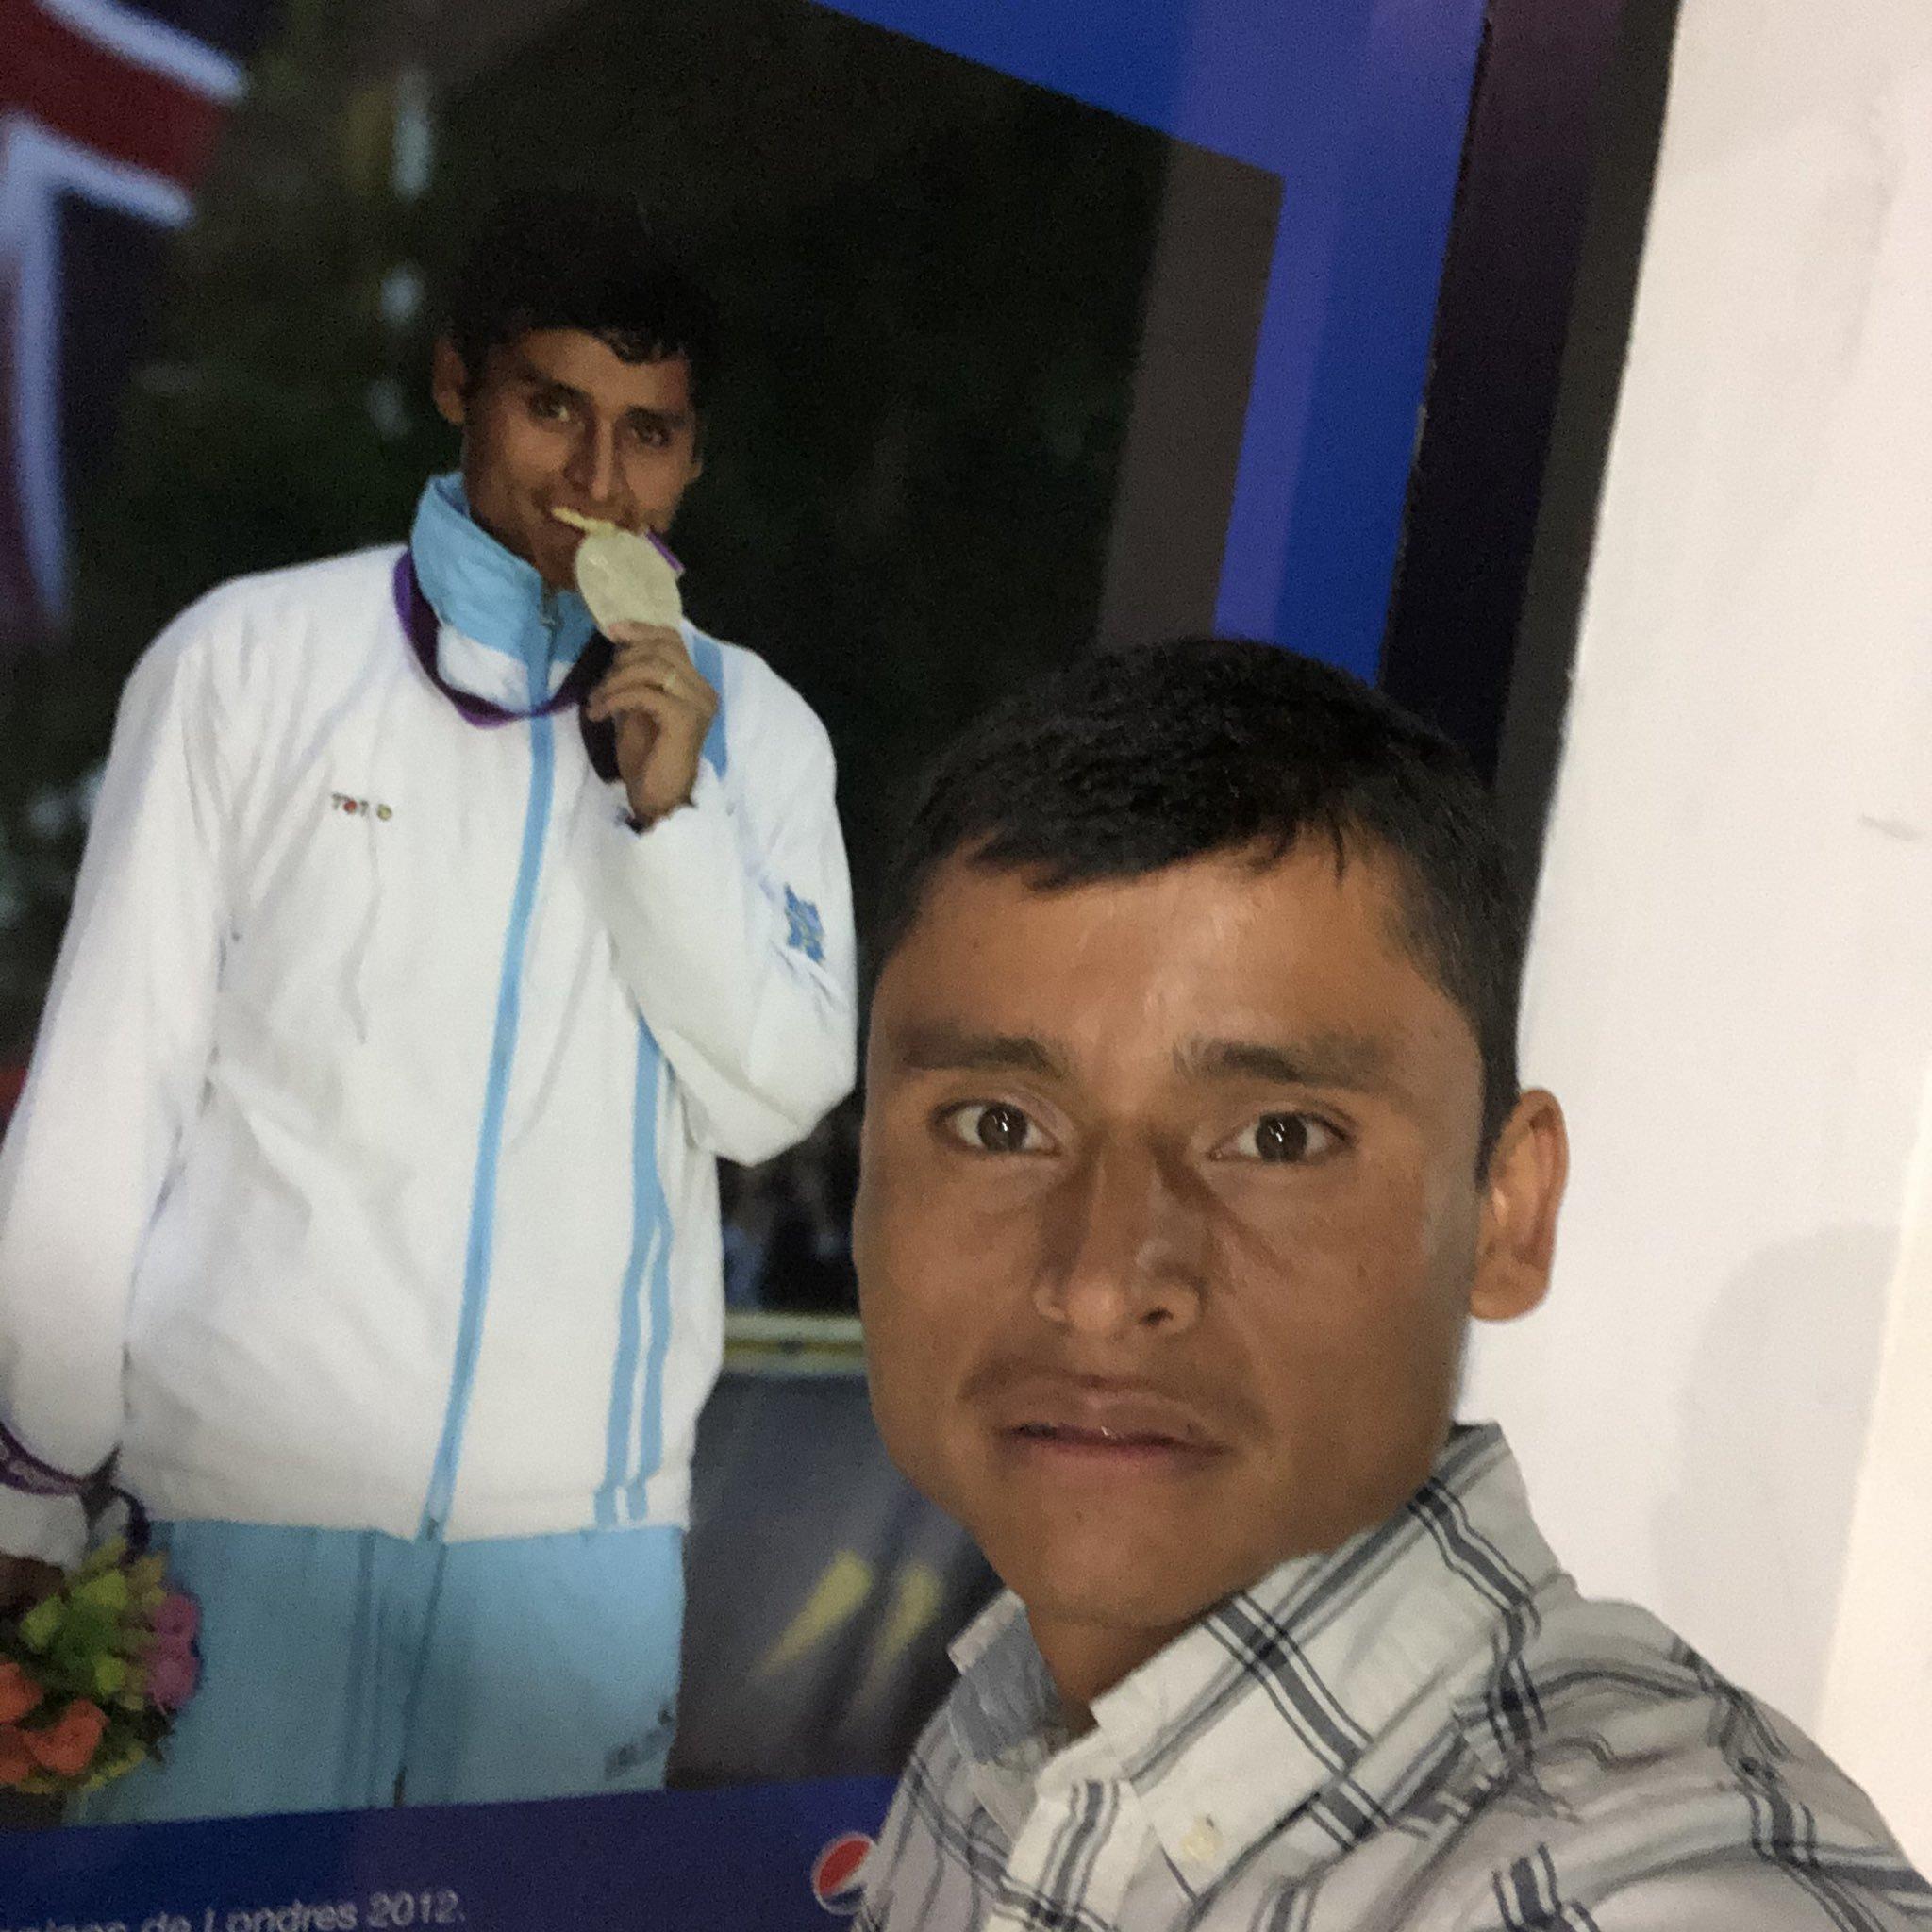 Erick Barrondo posa con su medalla olímpica de Londres 2012 | @ERICKBARRONDO14